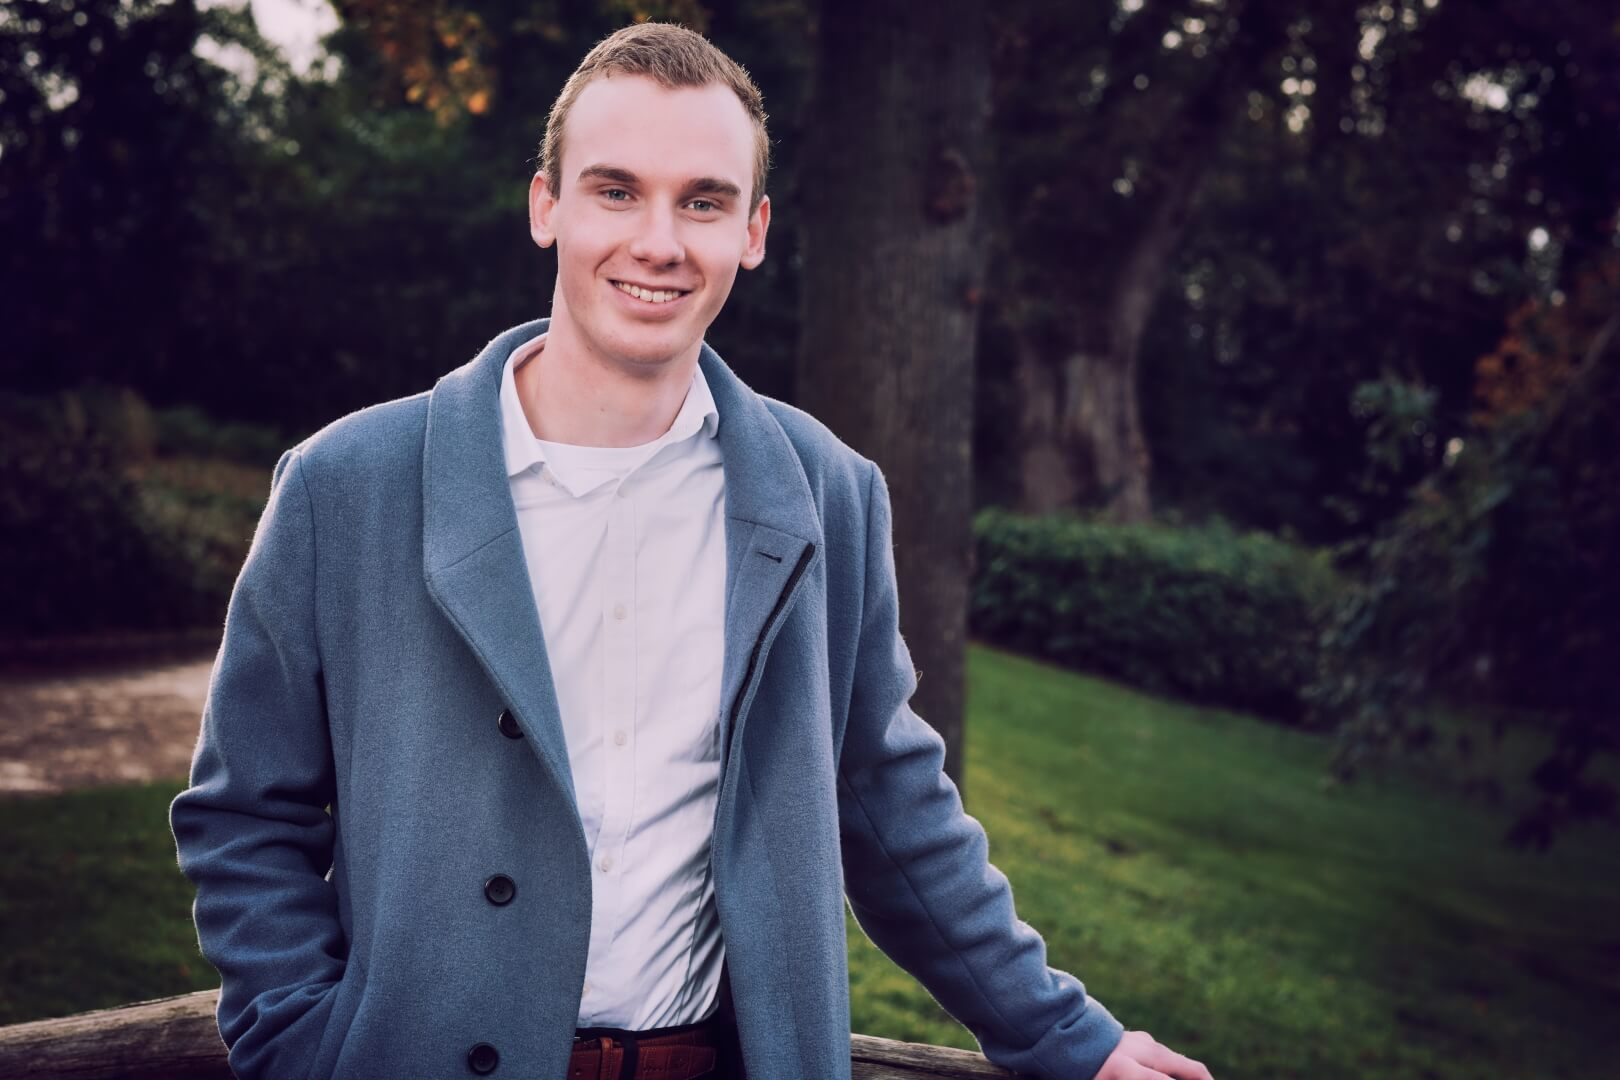 Profile picture of Yannick Caron, associate at D3cisive.